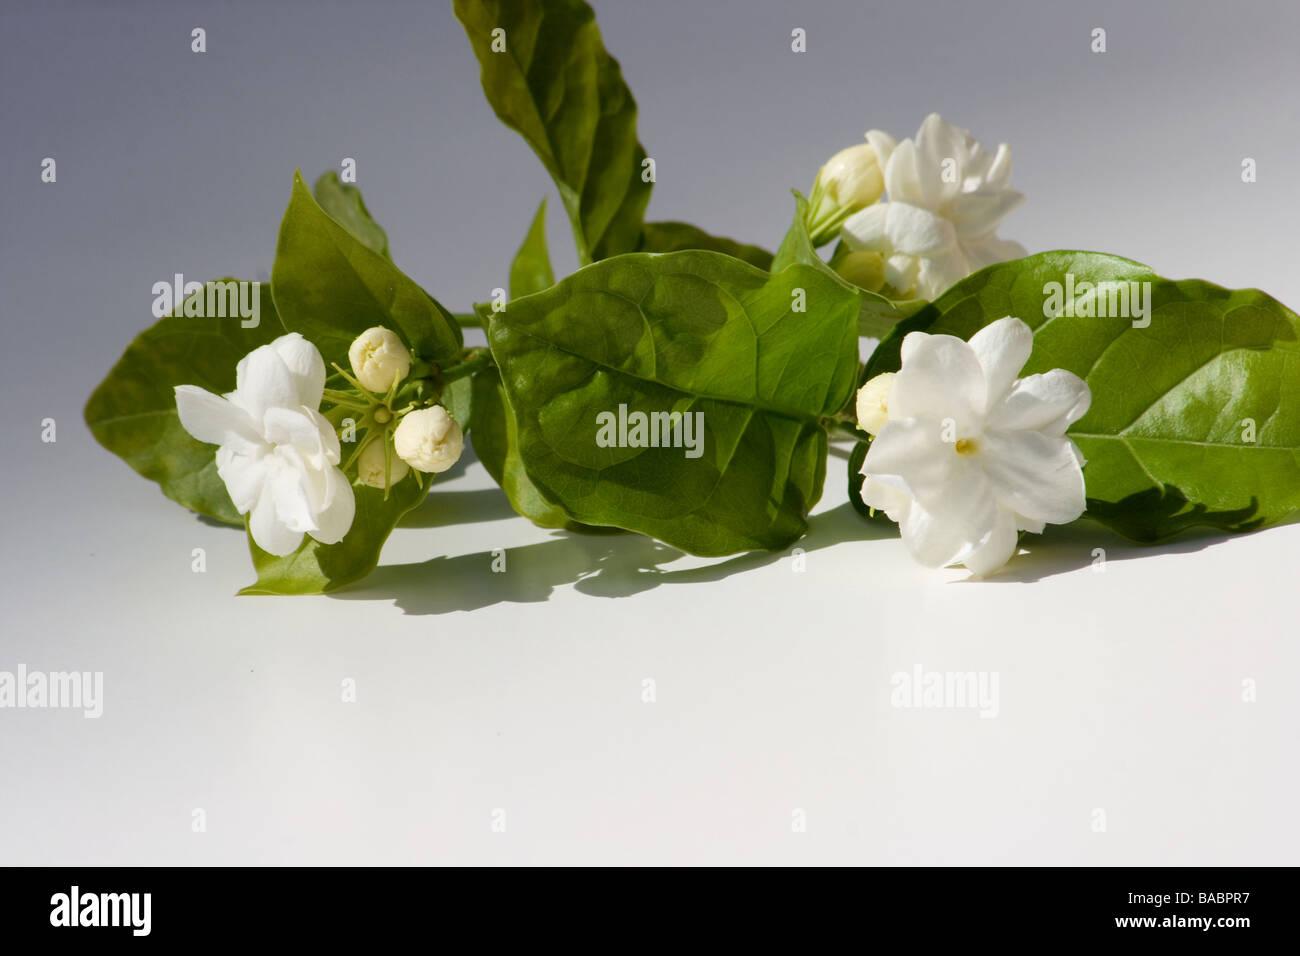 Arabian jasmine flowers on white background stock photo 23616299 arabian jasmine flowers on white background izmirmasajfo